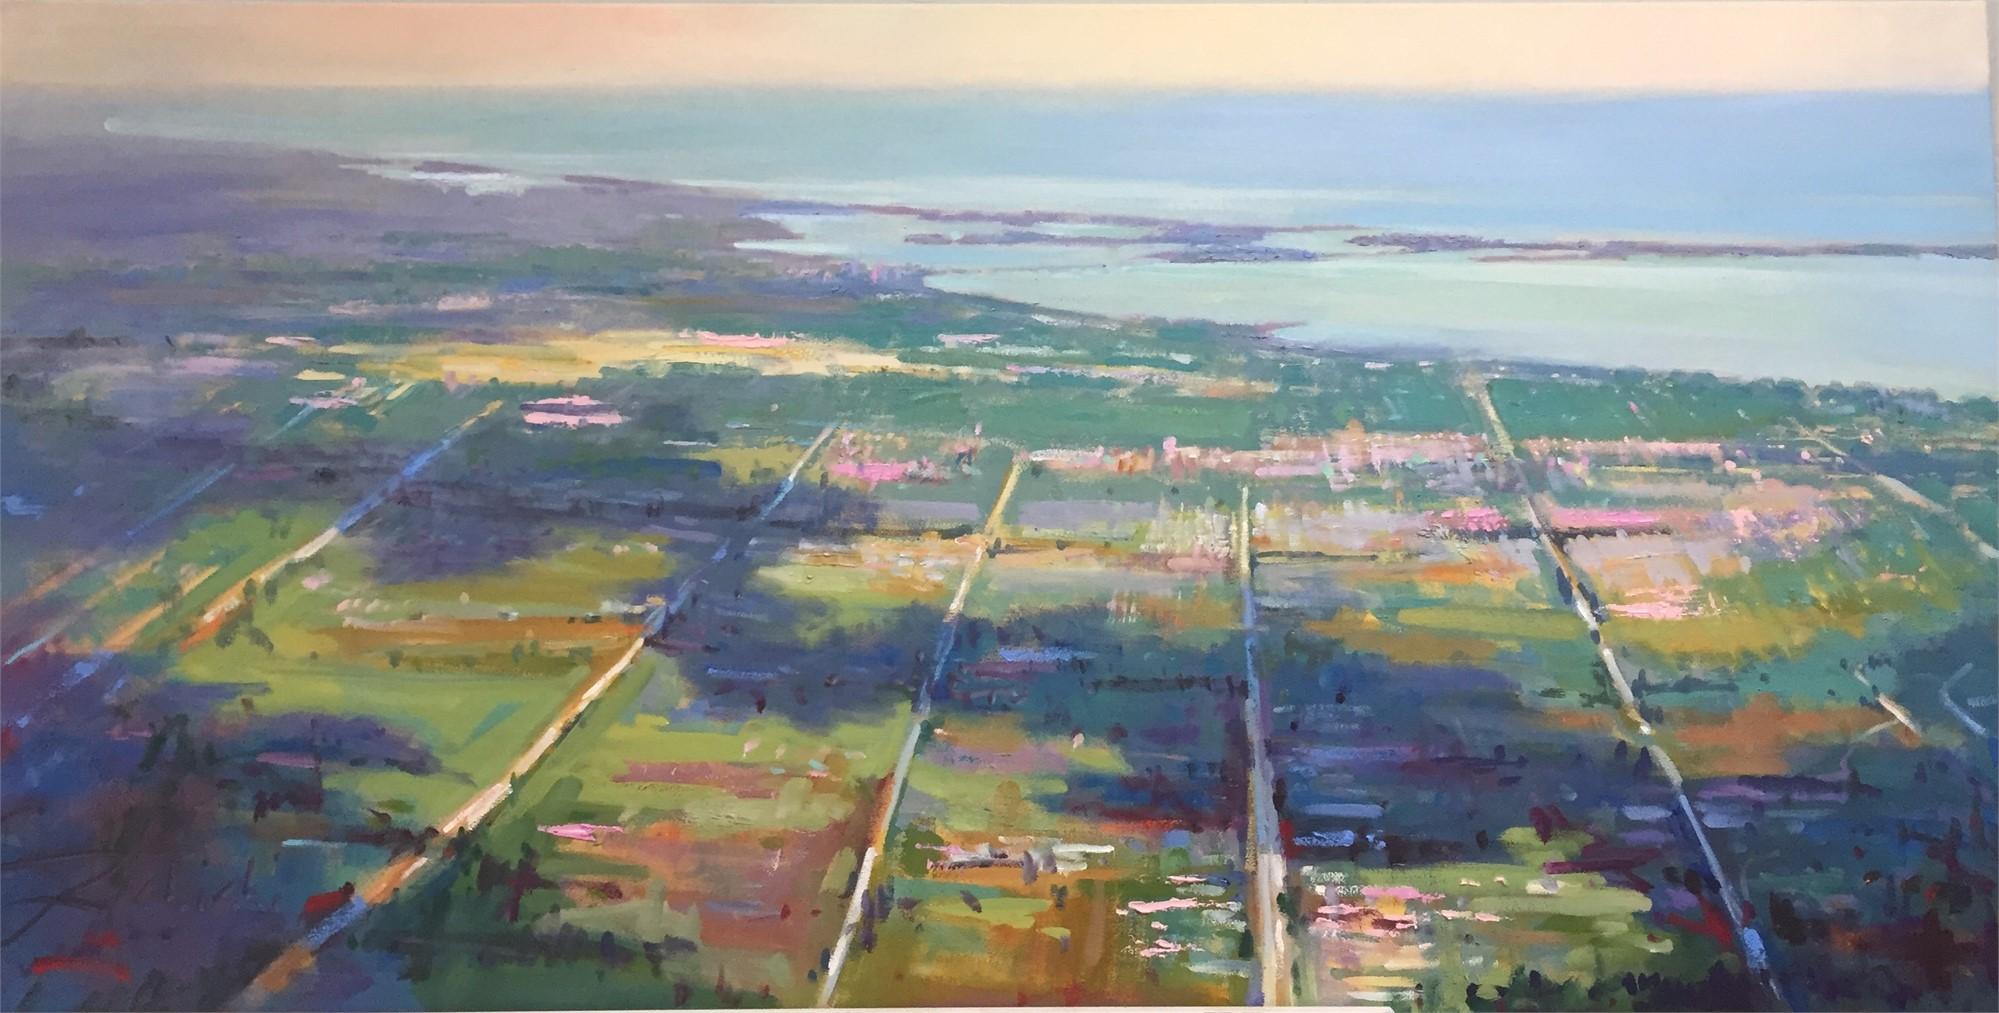 Sarasota From Above by Linda Richichi